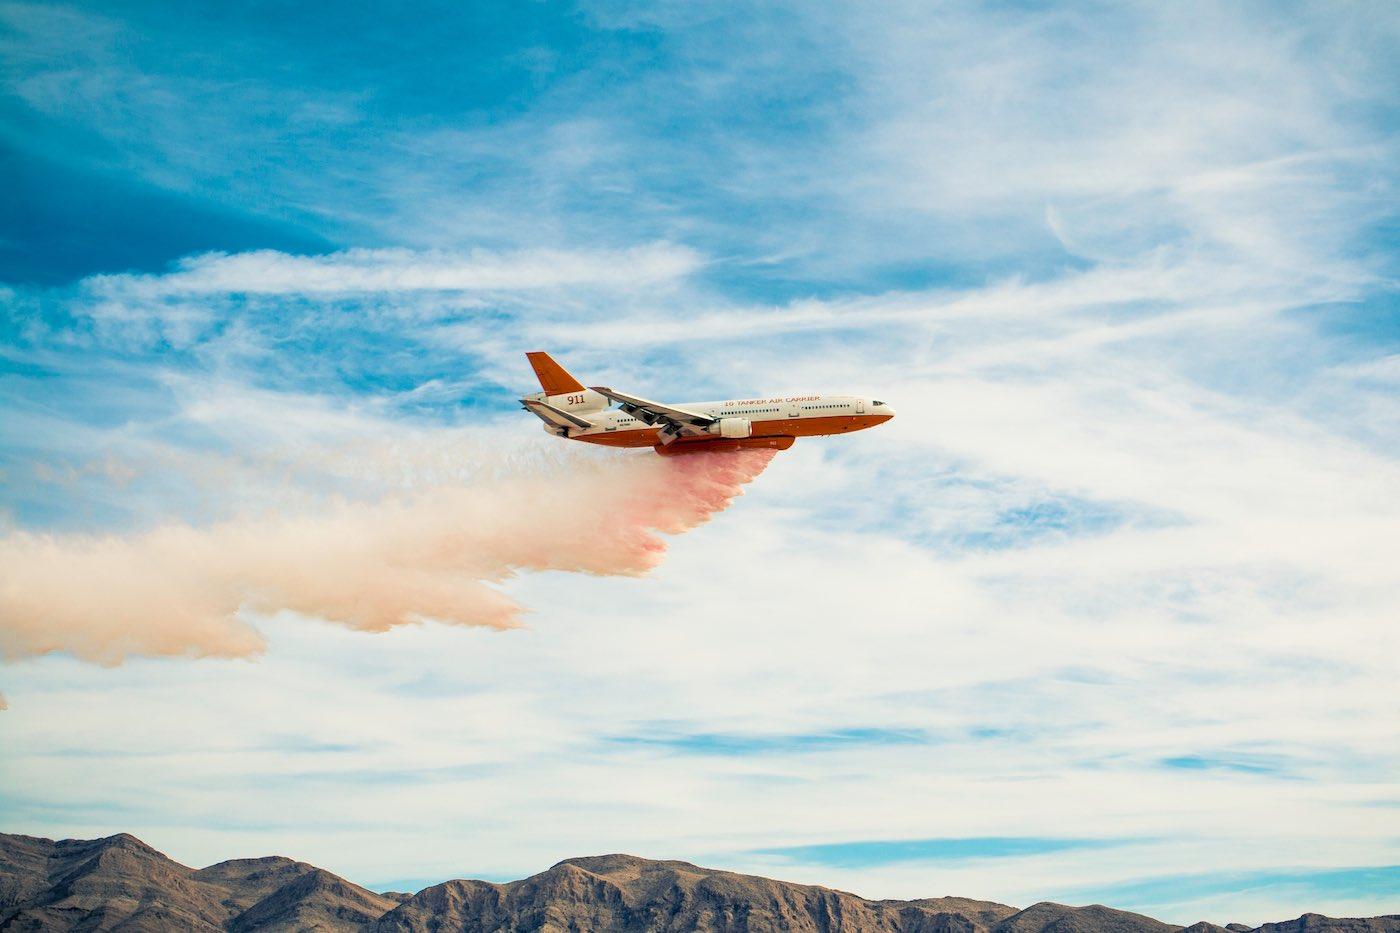 förbättra luft - Photo by Aaron Barnaby